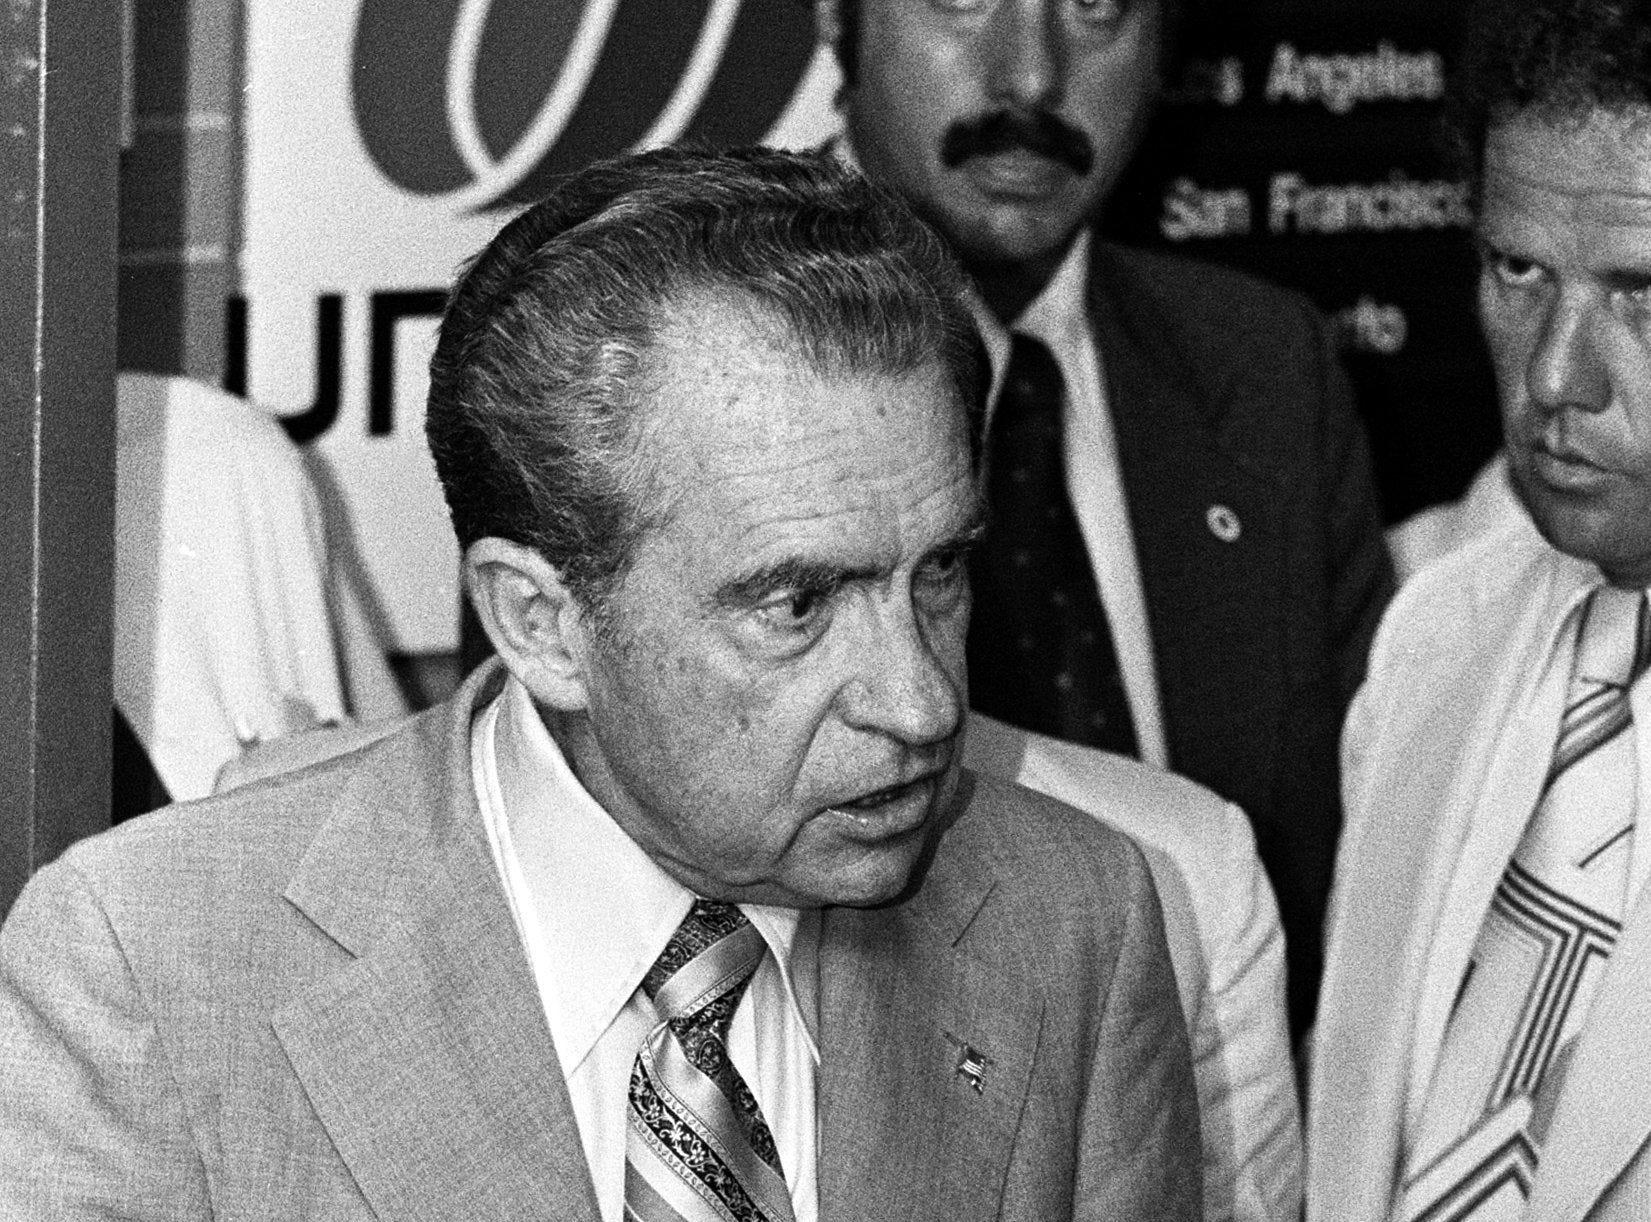 Former President Richard Nixon speaks to a crowd at Memphis International Airport on 2 Jul 1977.